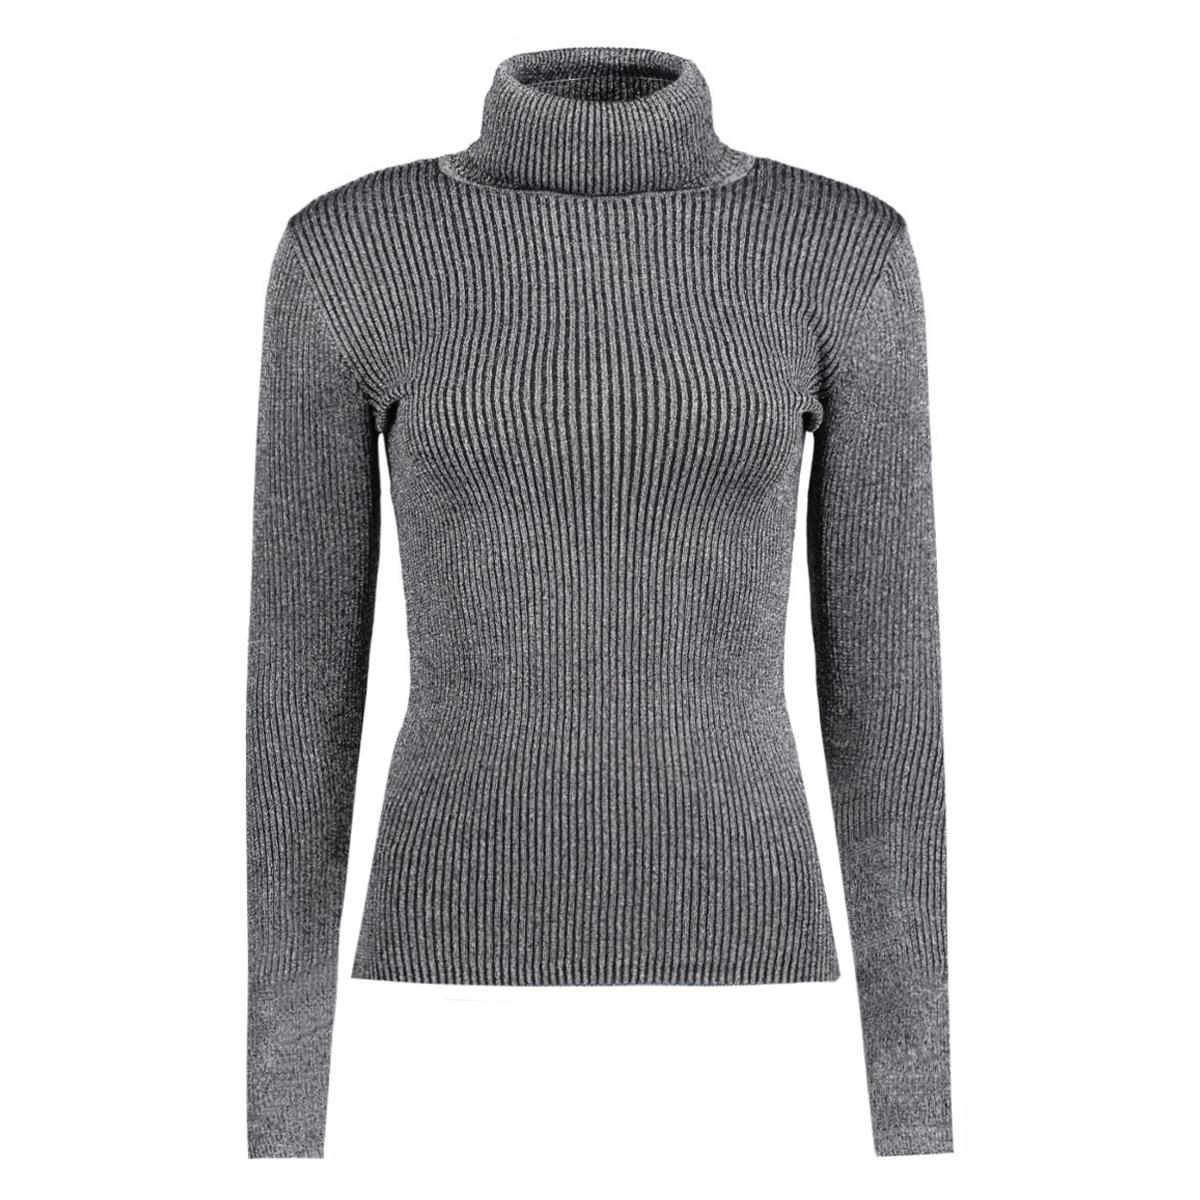 vivenna l/s rollneck knit top 14037554 vila trui black/black with